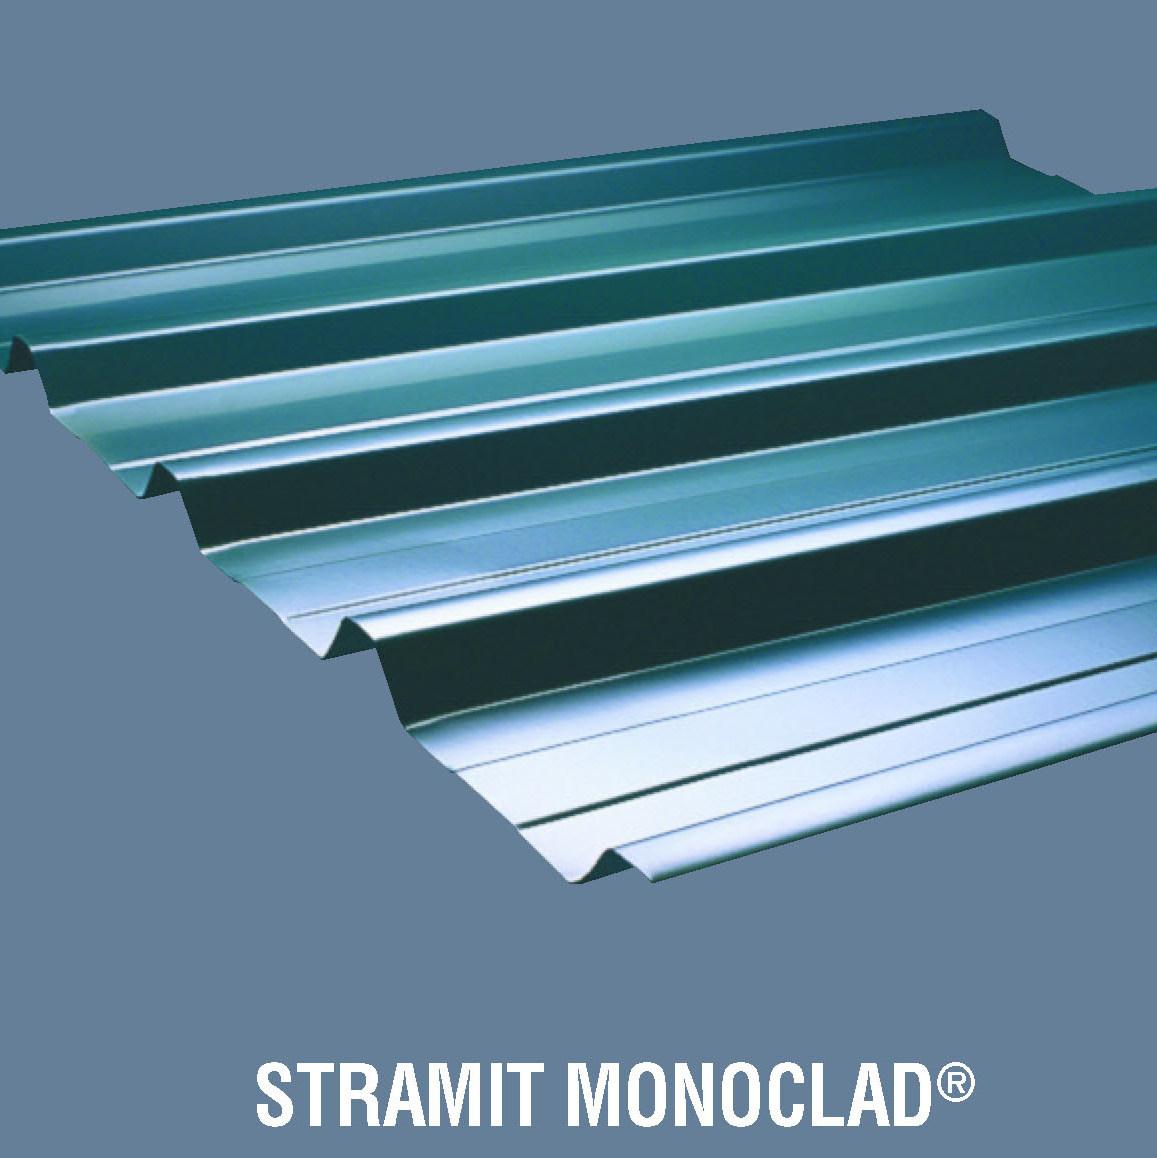 Stramit Monoclad